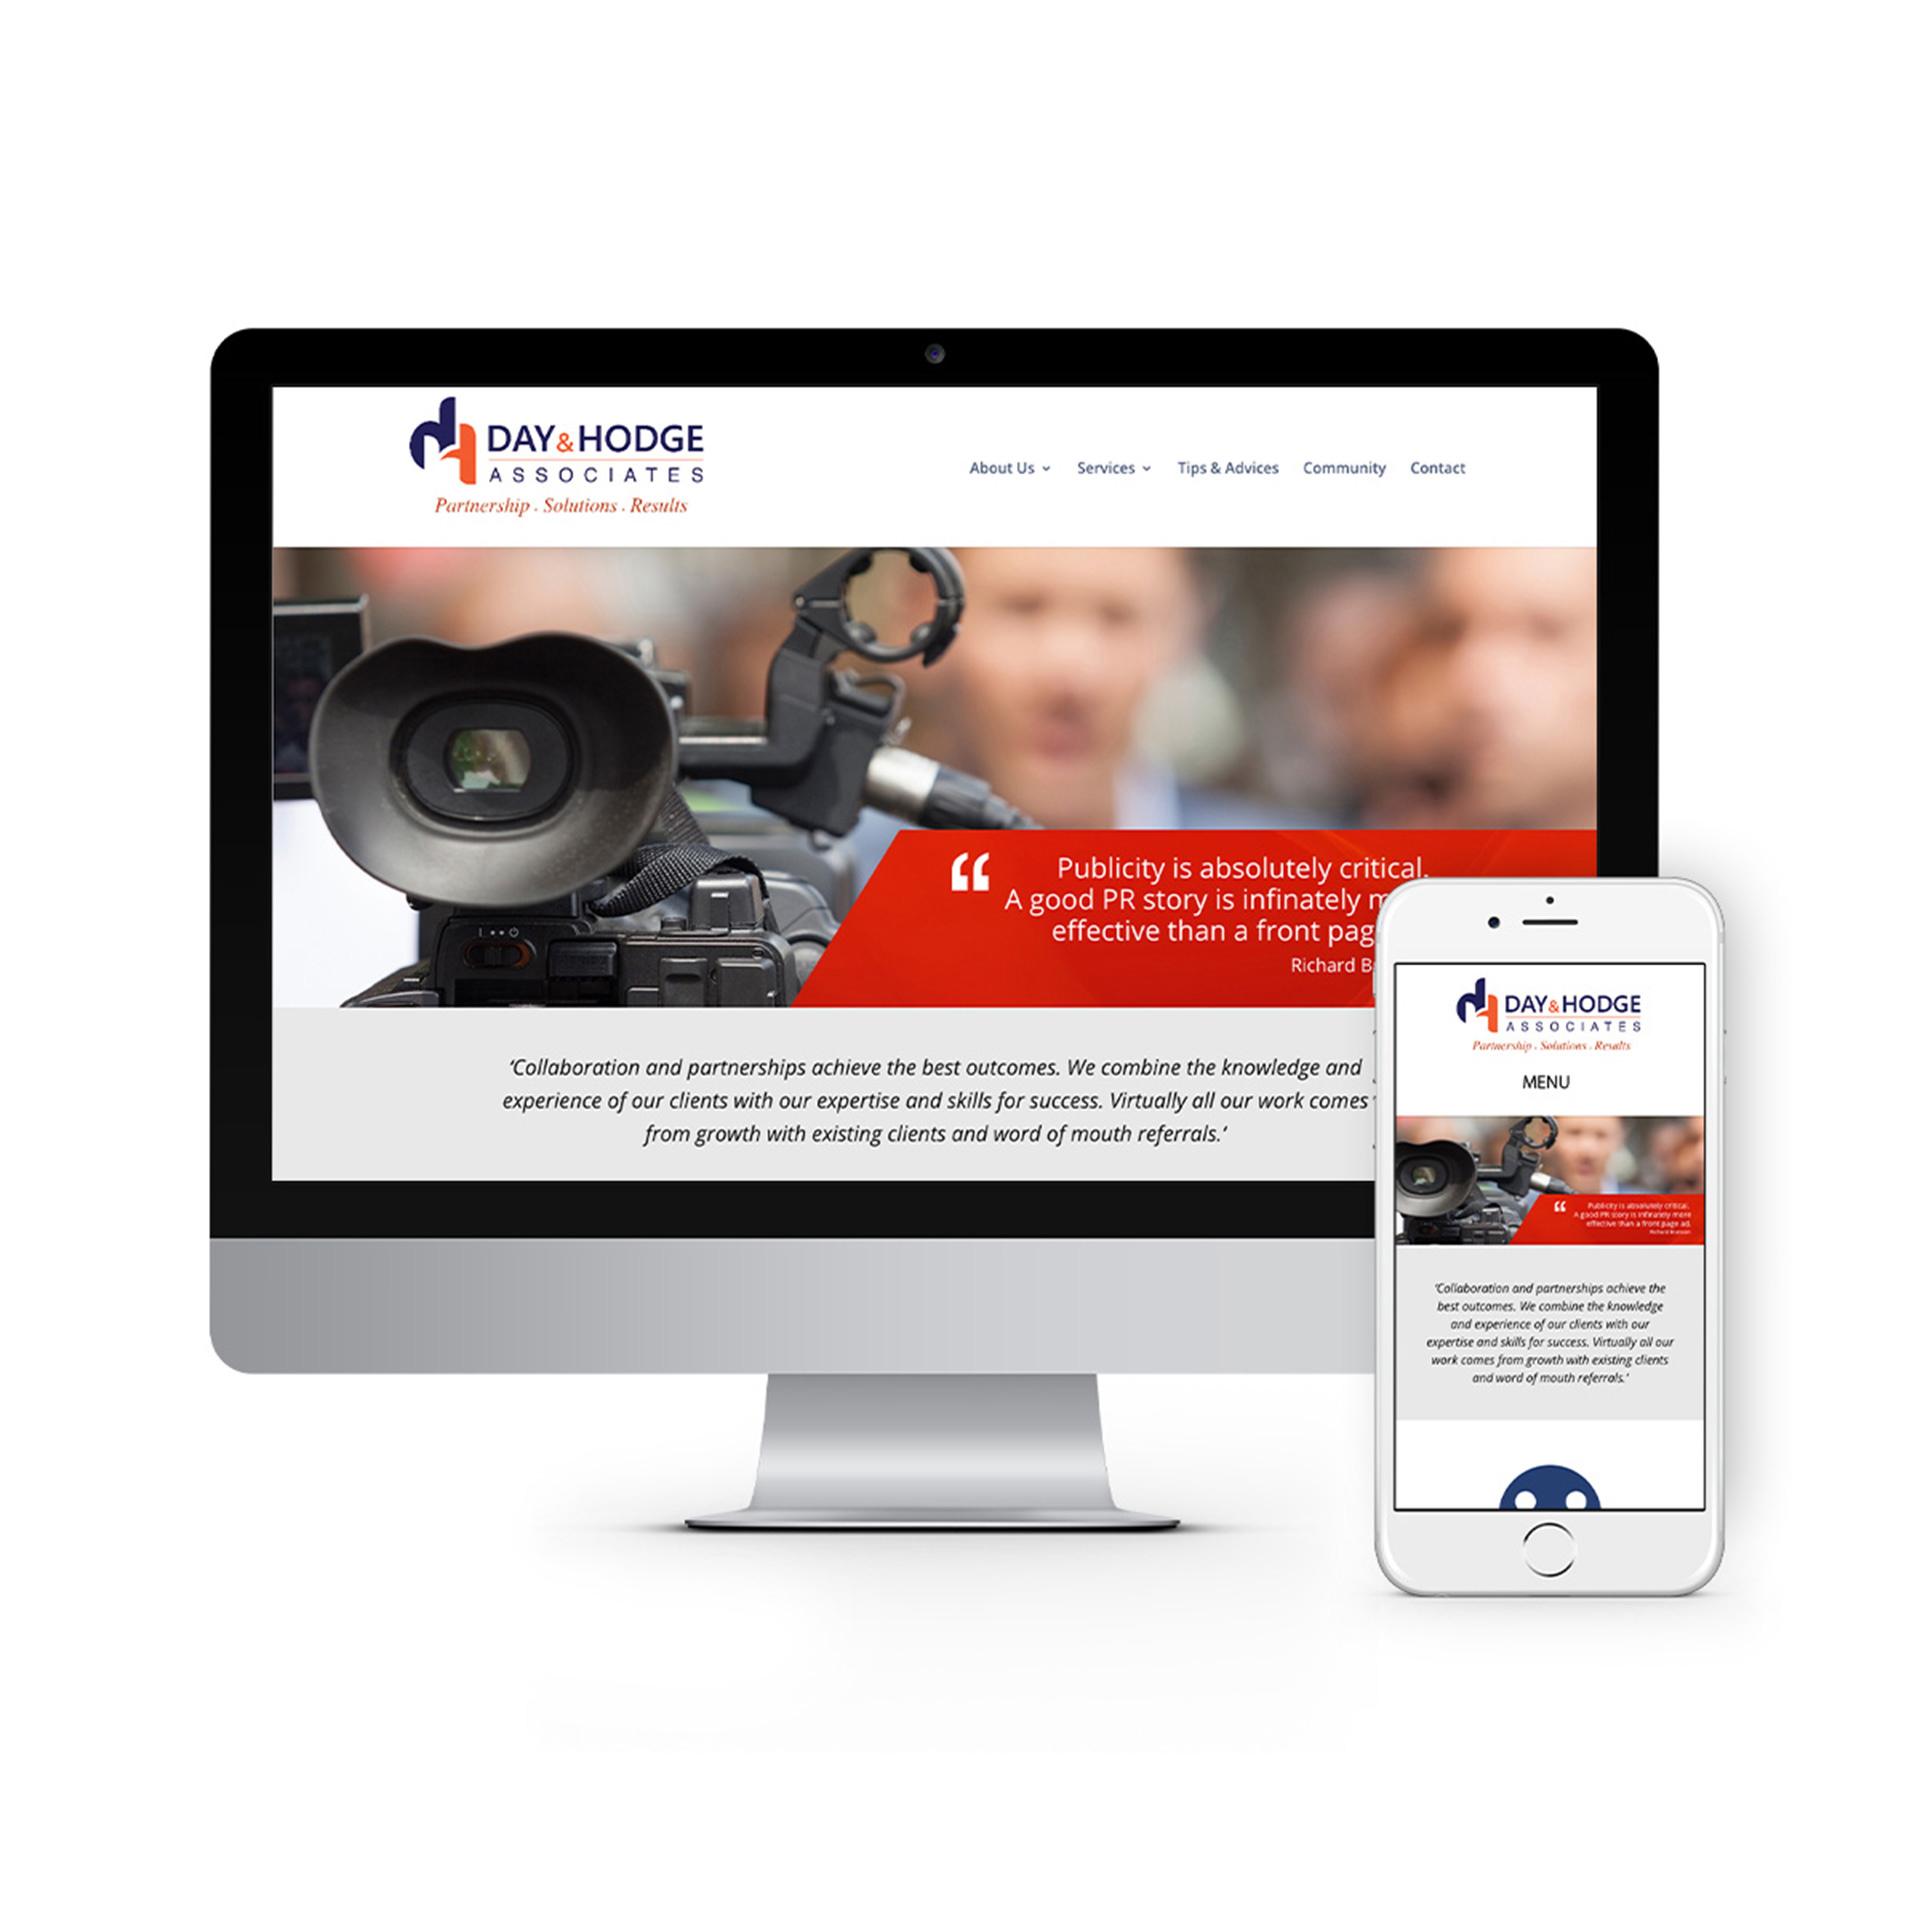 Day and Hodge Associates Website Design 2020